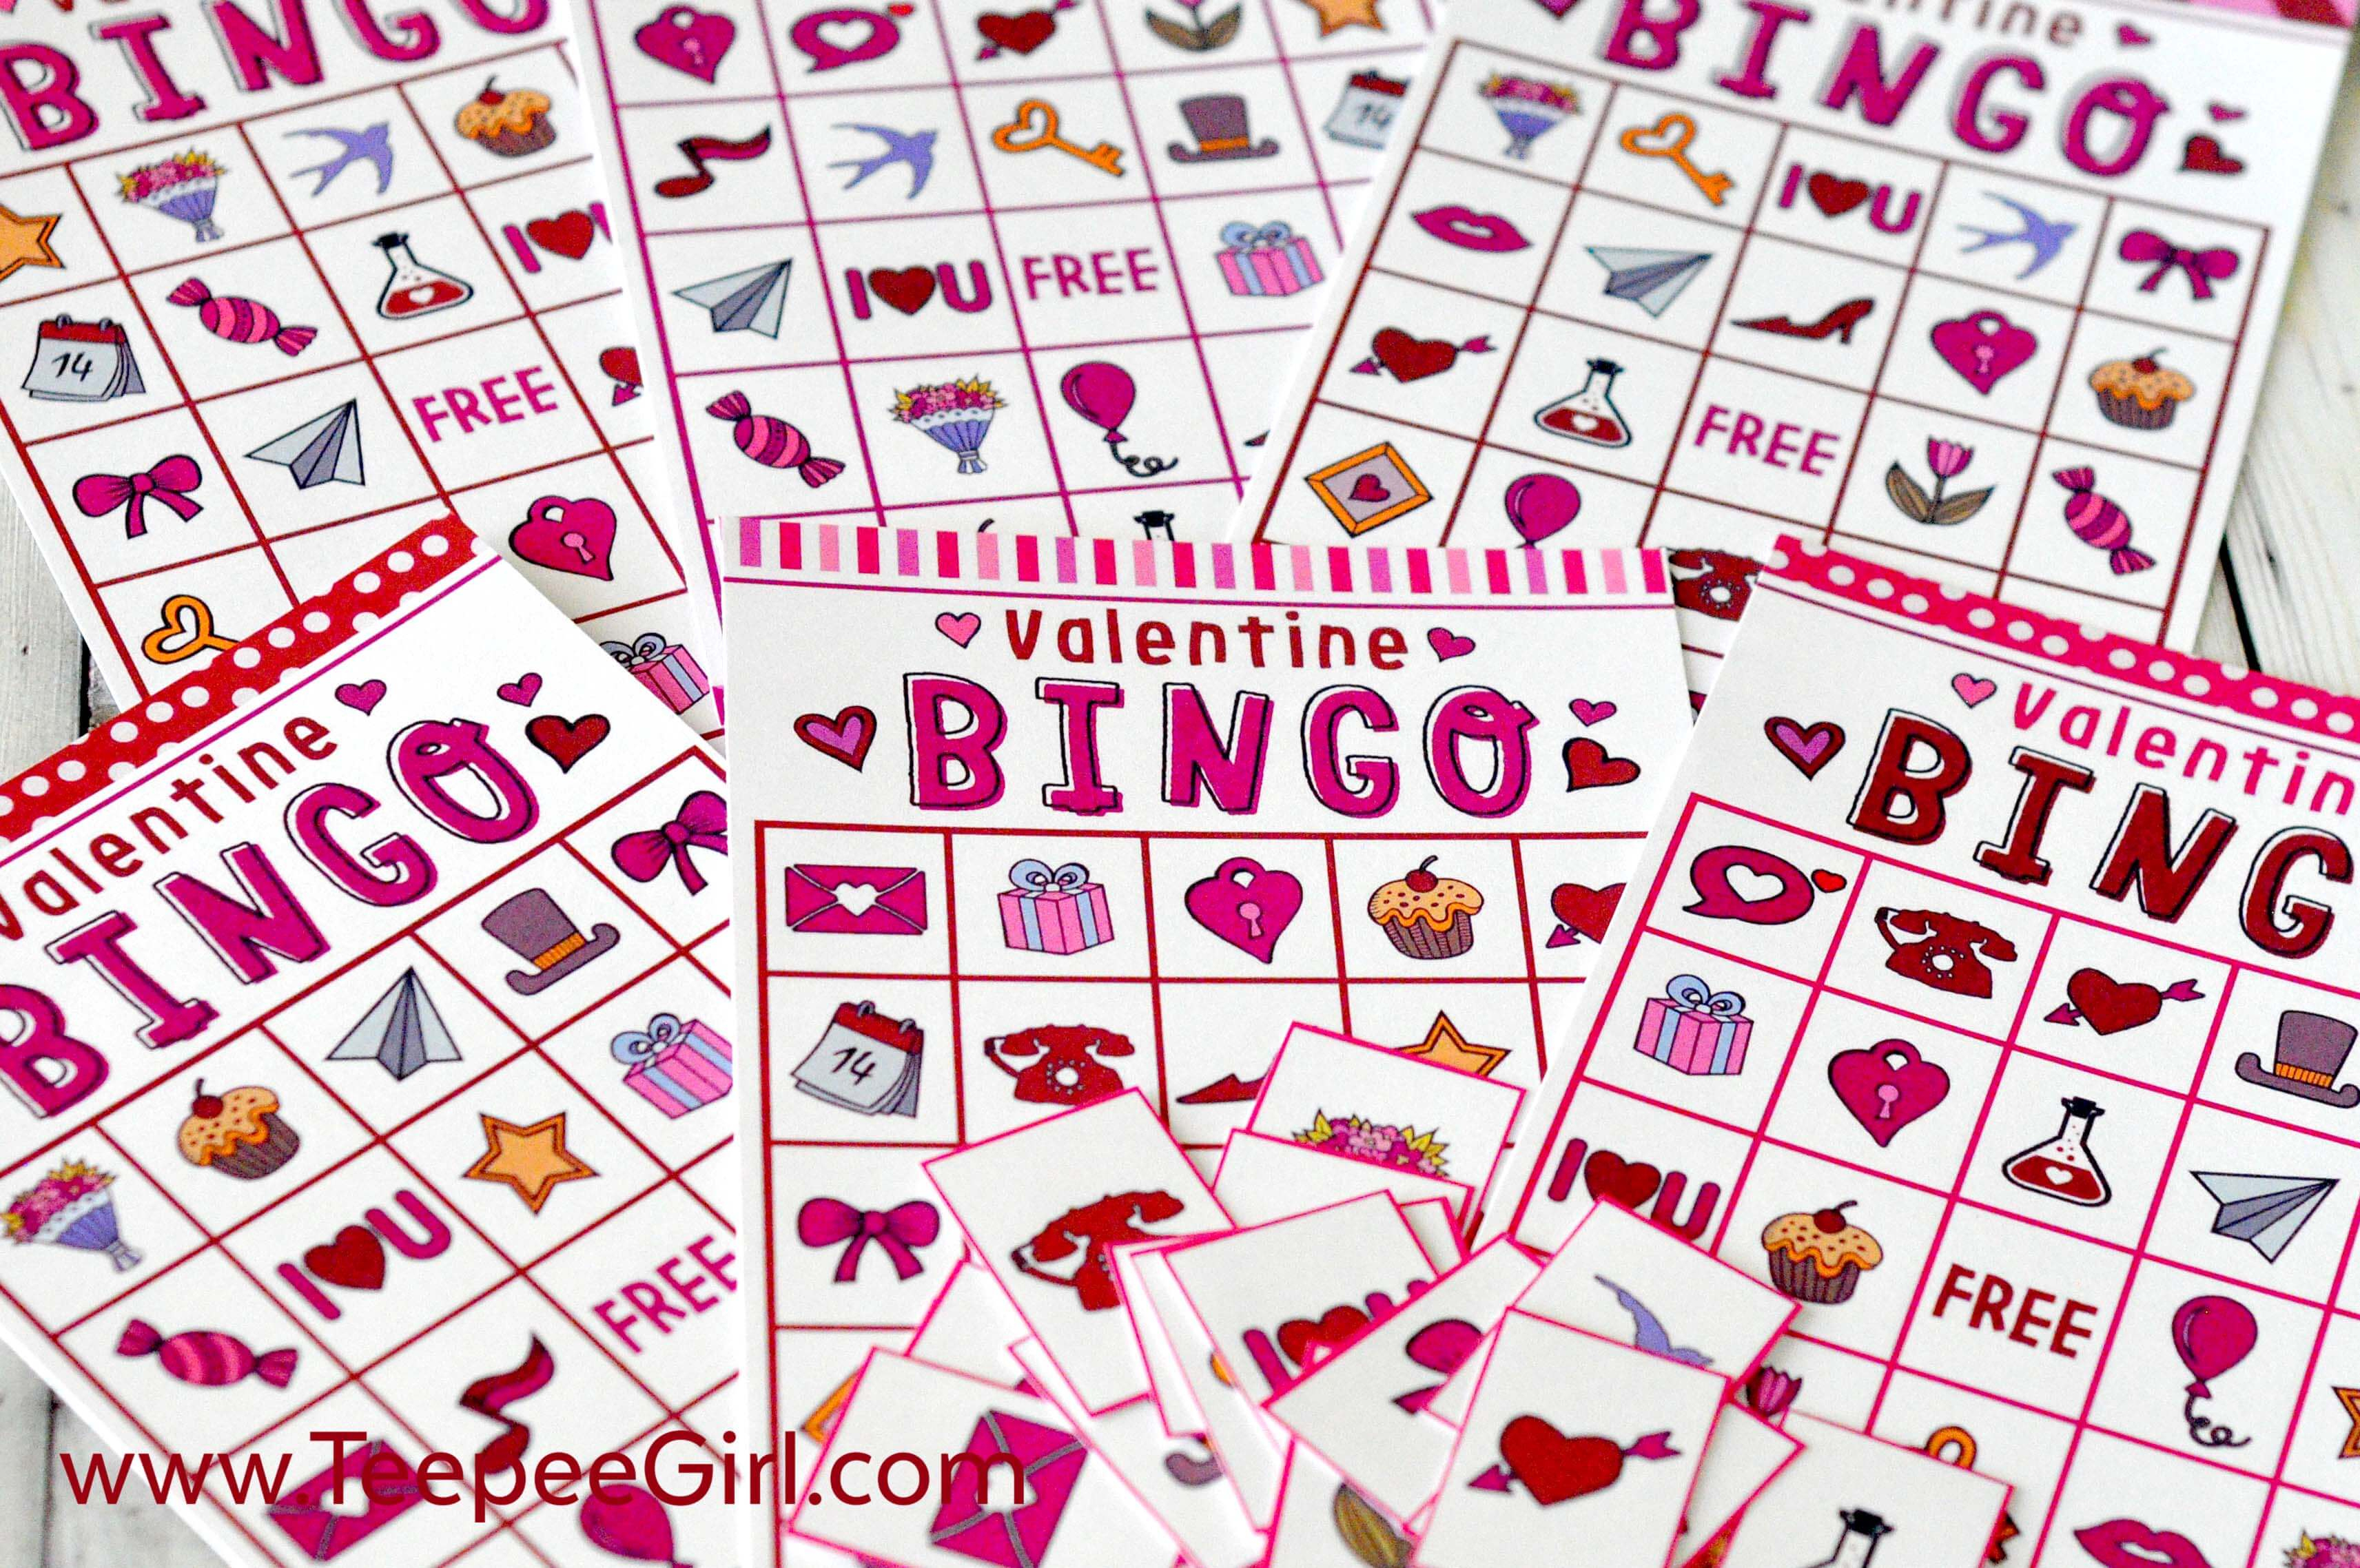 Free Valentines Day Printable Bingo Game - Valentine Bingo Free Printable